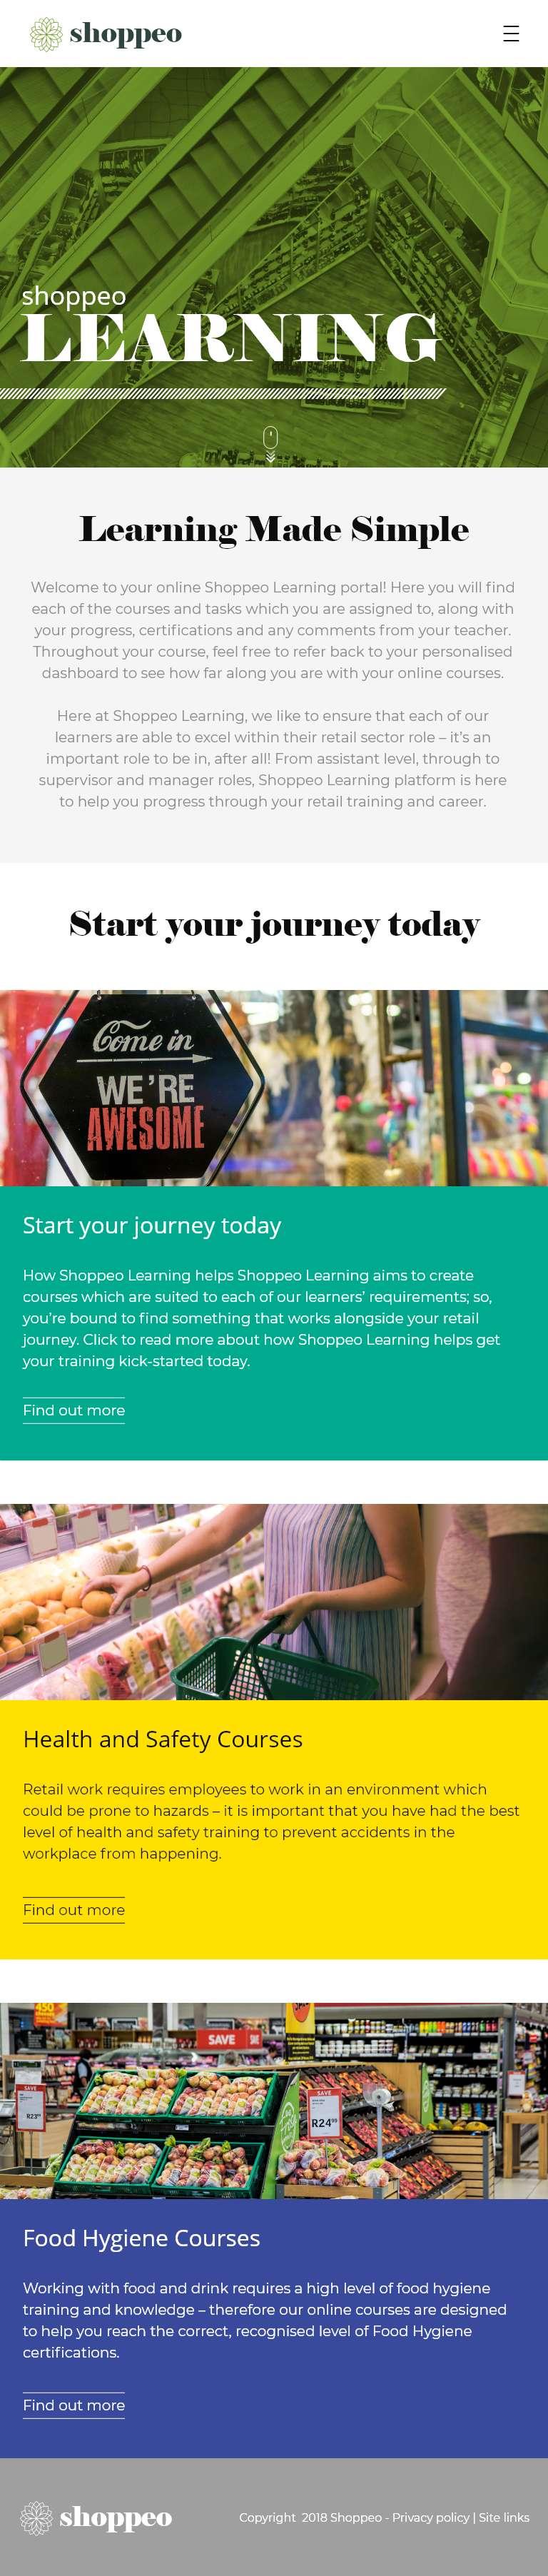 Design It - Shoppeo - Tablet